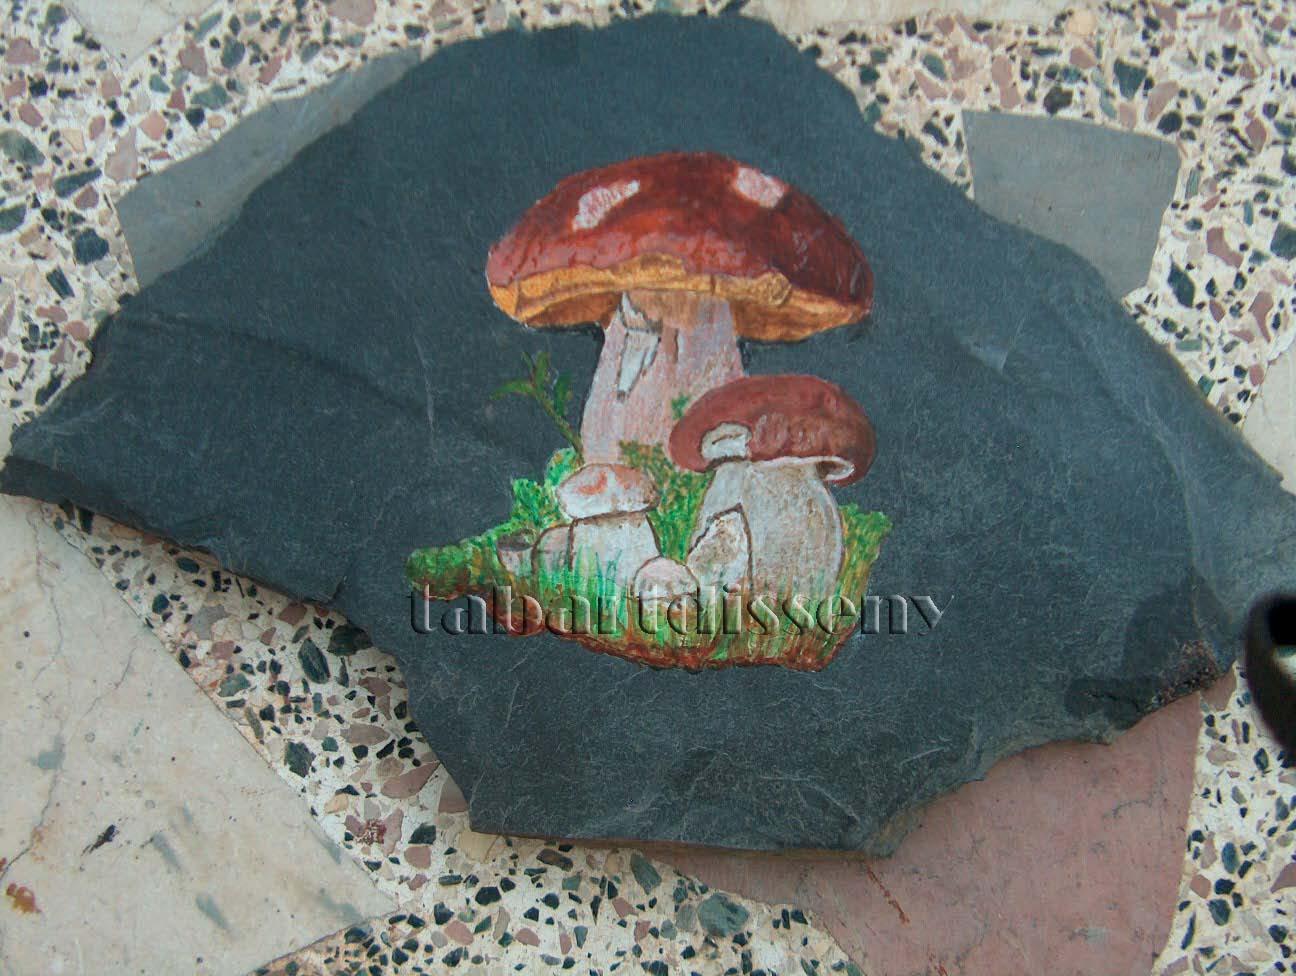 Tabartdisseny pintar piedra de pizarra setas for Pintura para pintar piedras